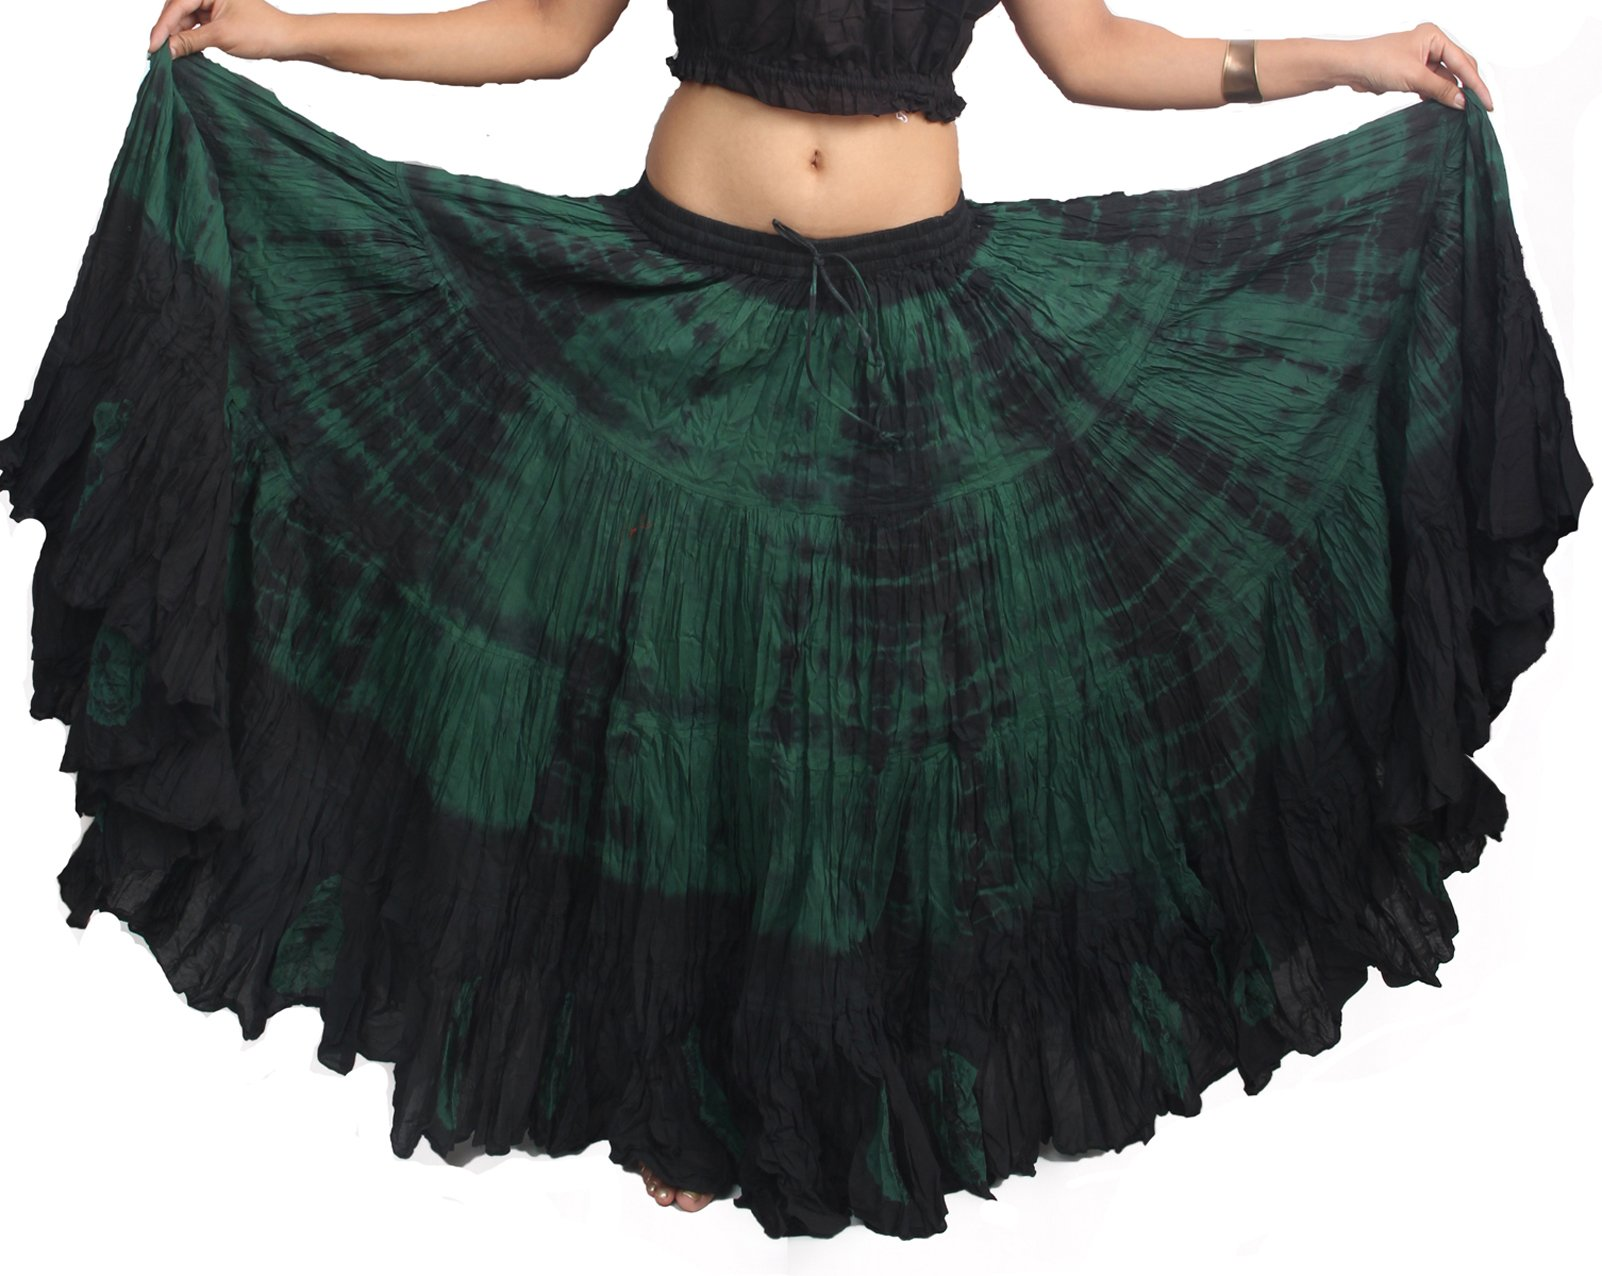 Wevez Women's American 25 Yard Cotton Skirt